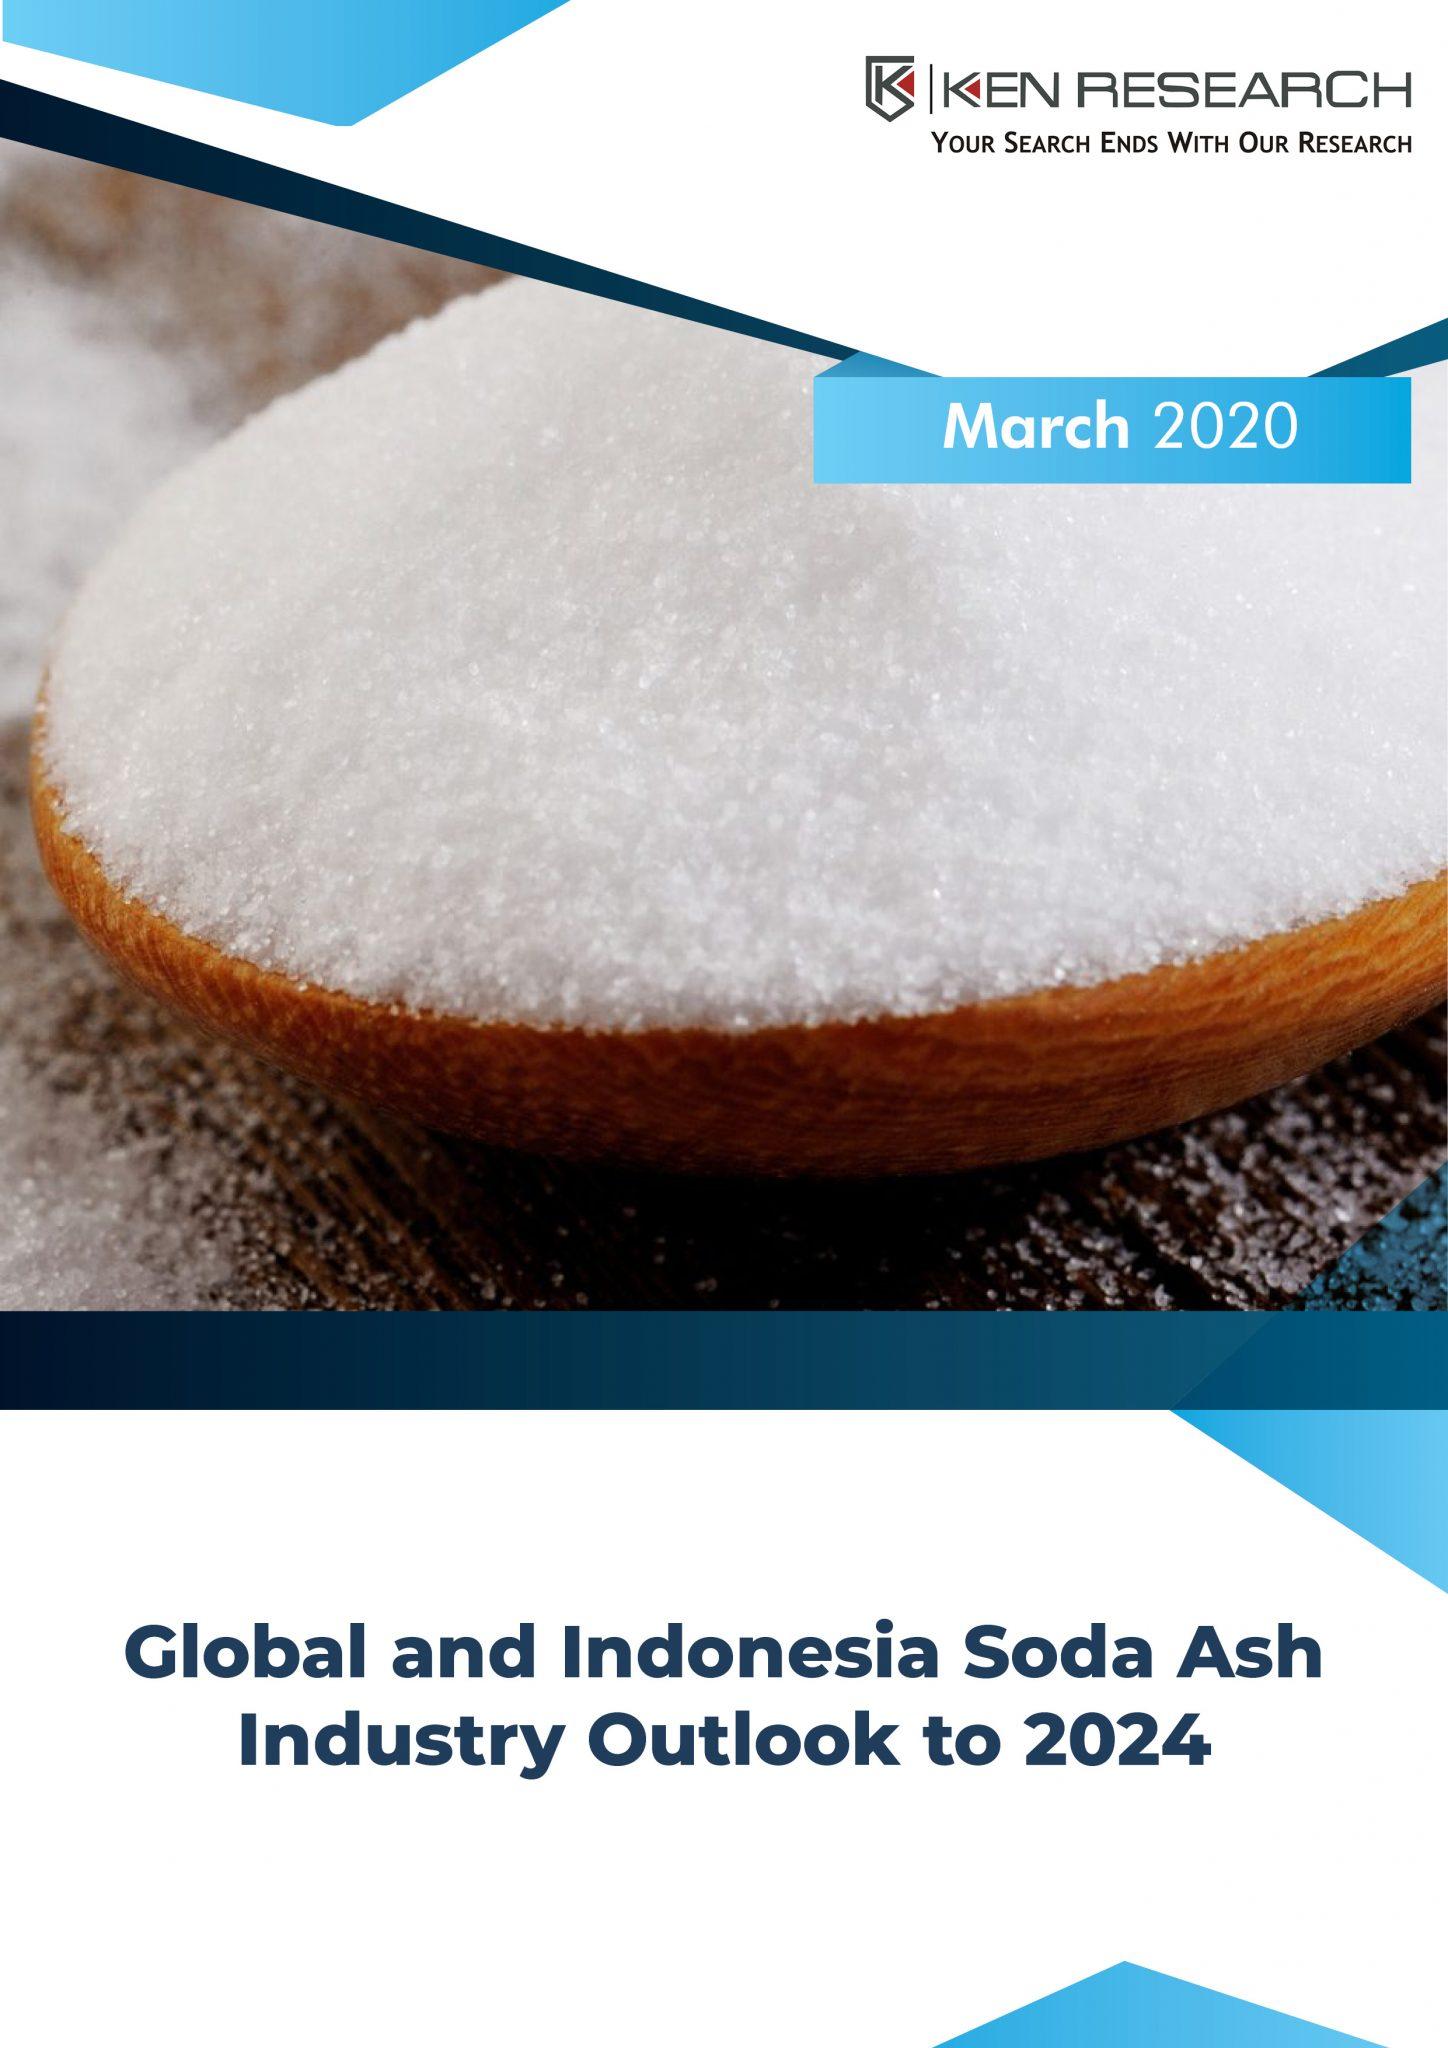 Global-and-Indonesia-Soda-Ash-Industry.jpg